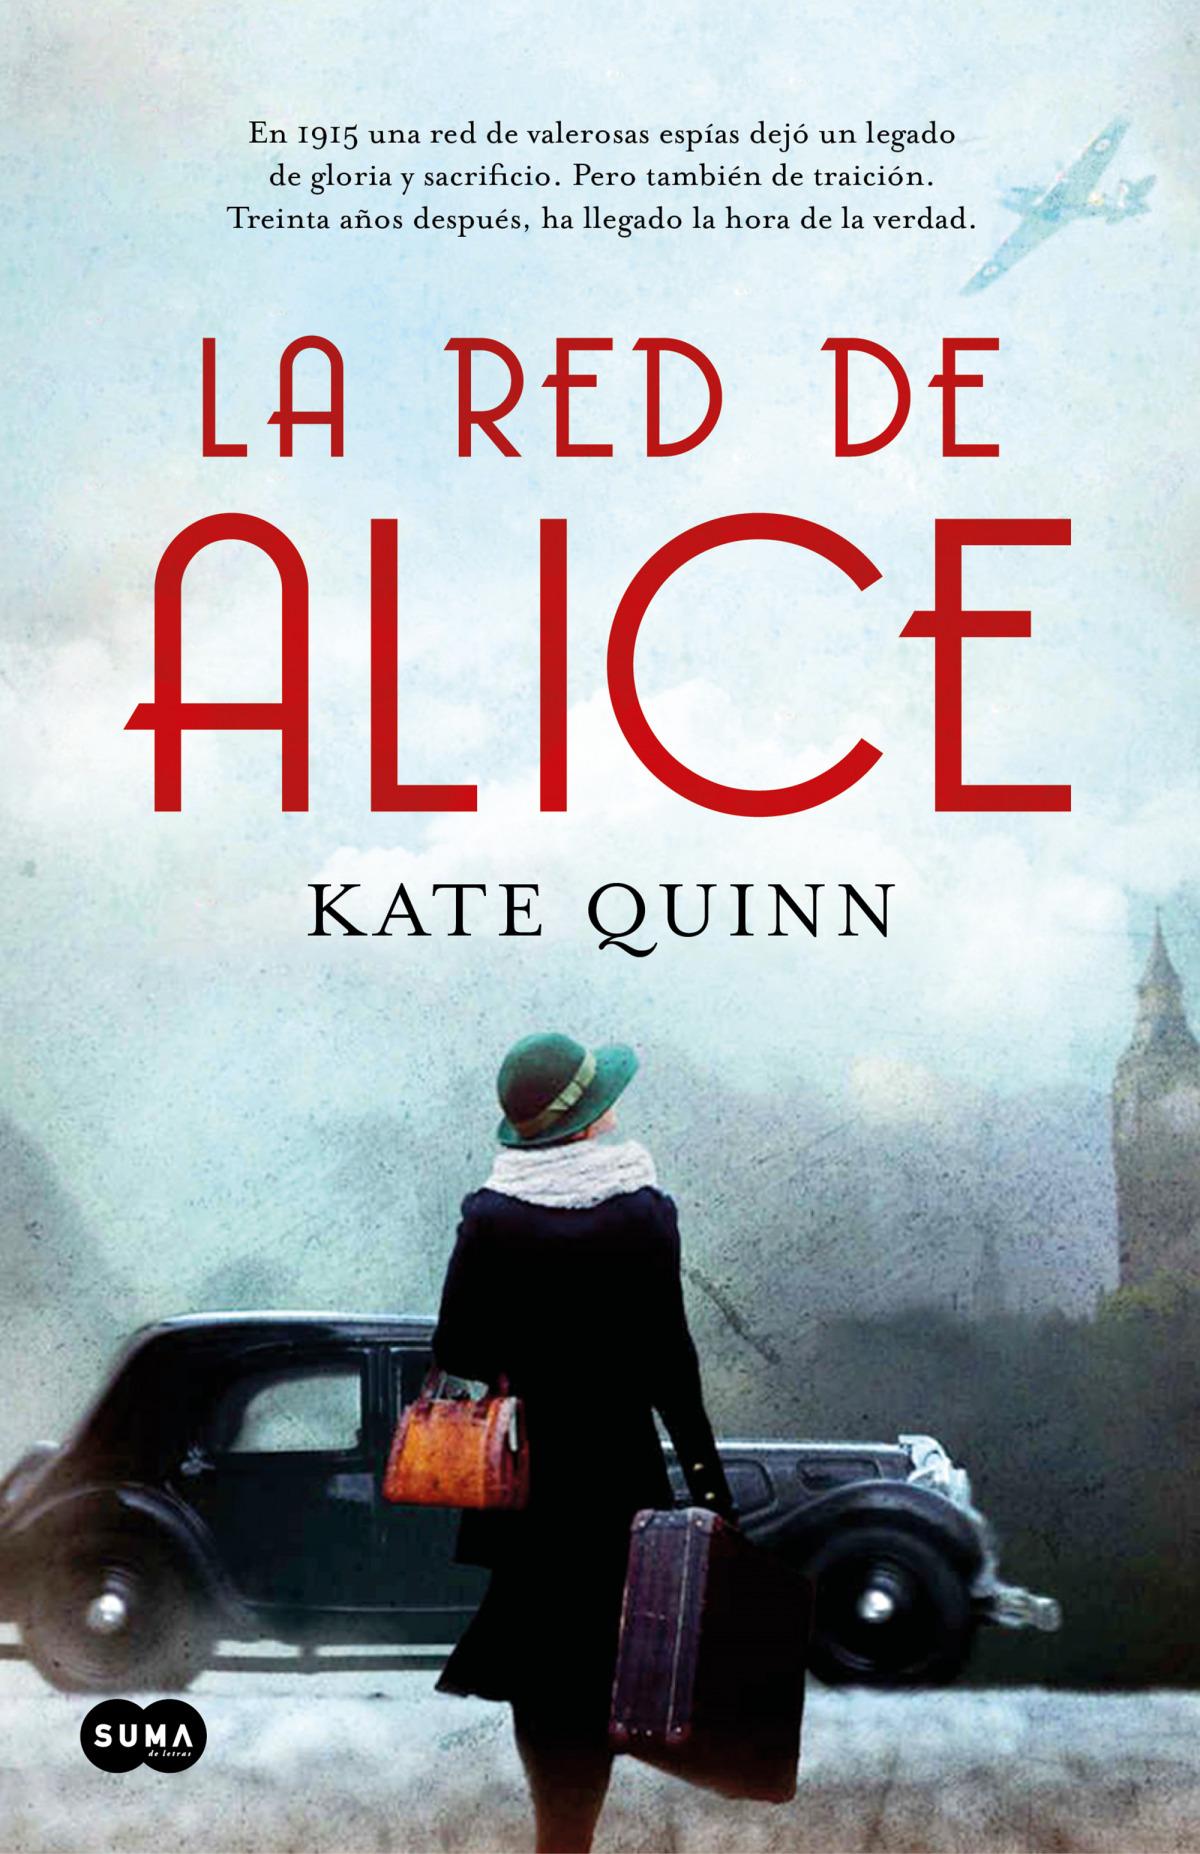 Red de Alice 9788491292913